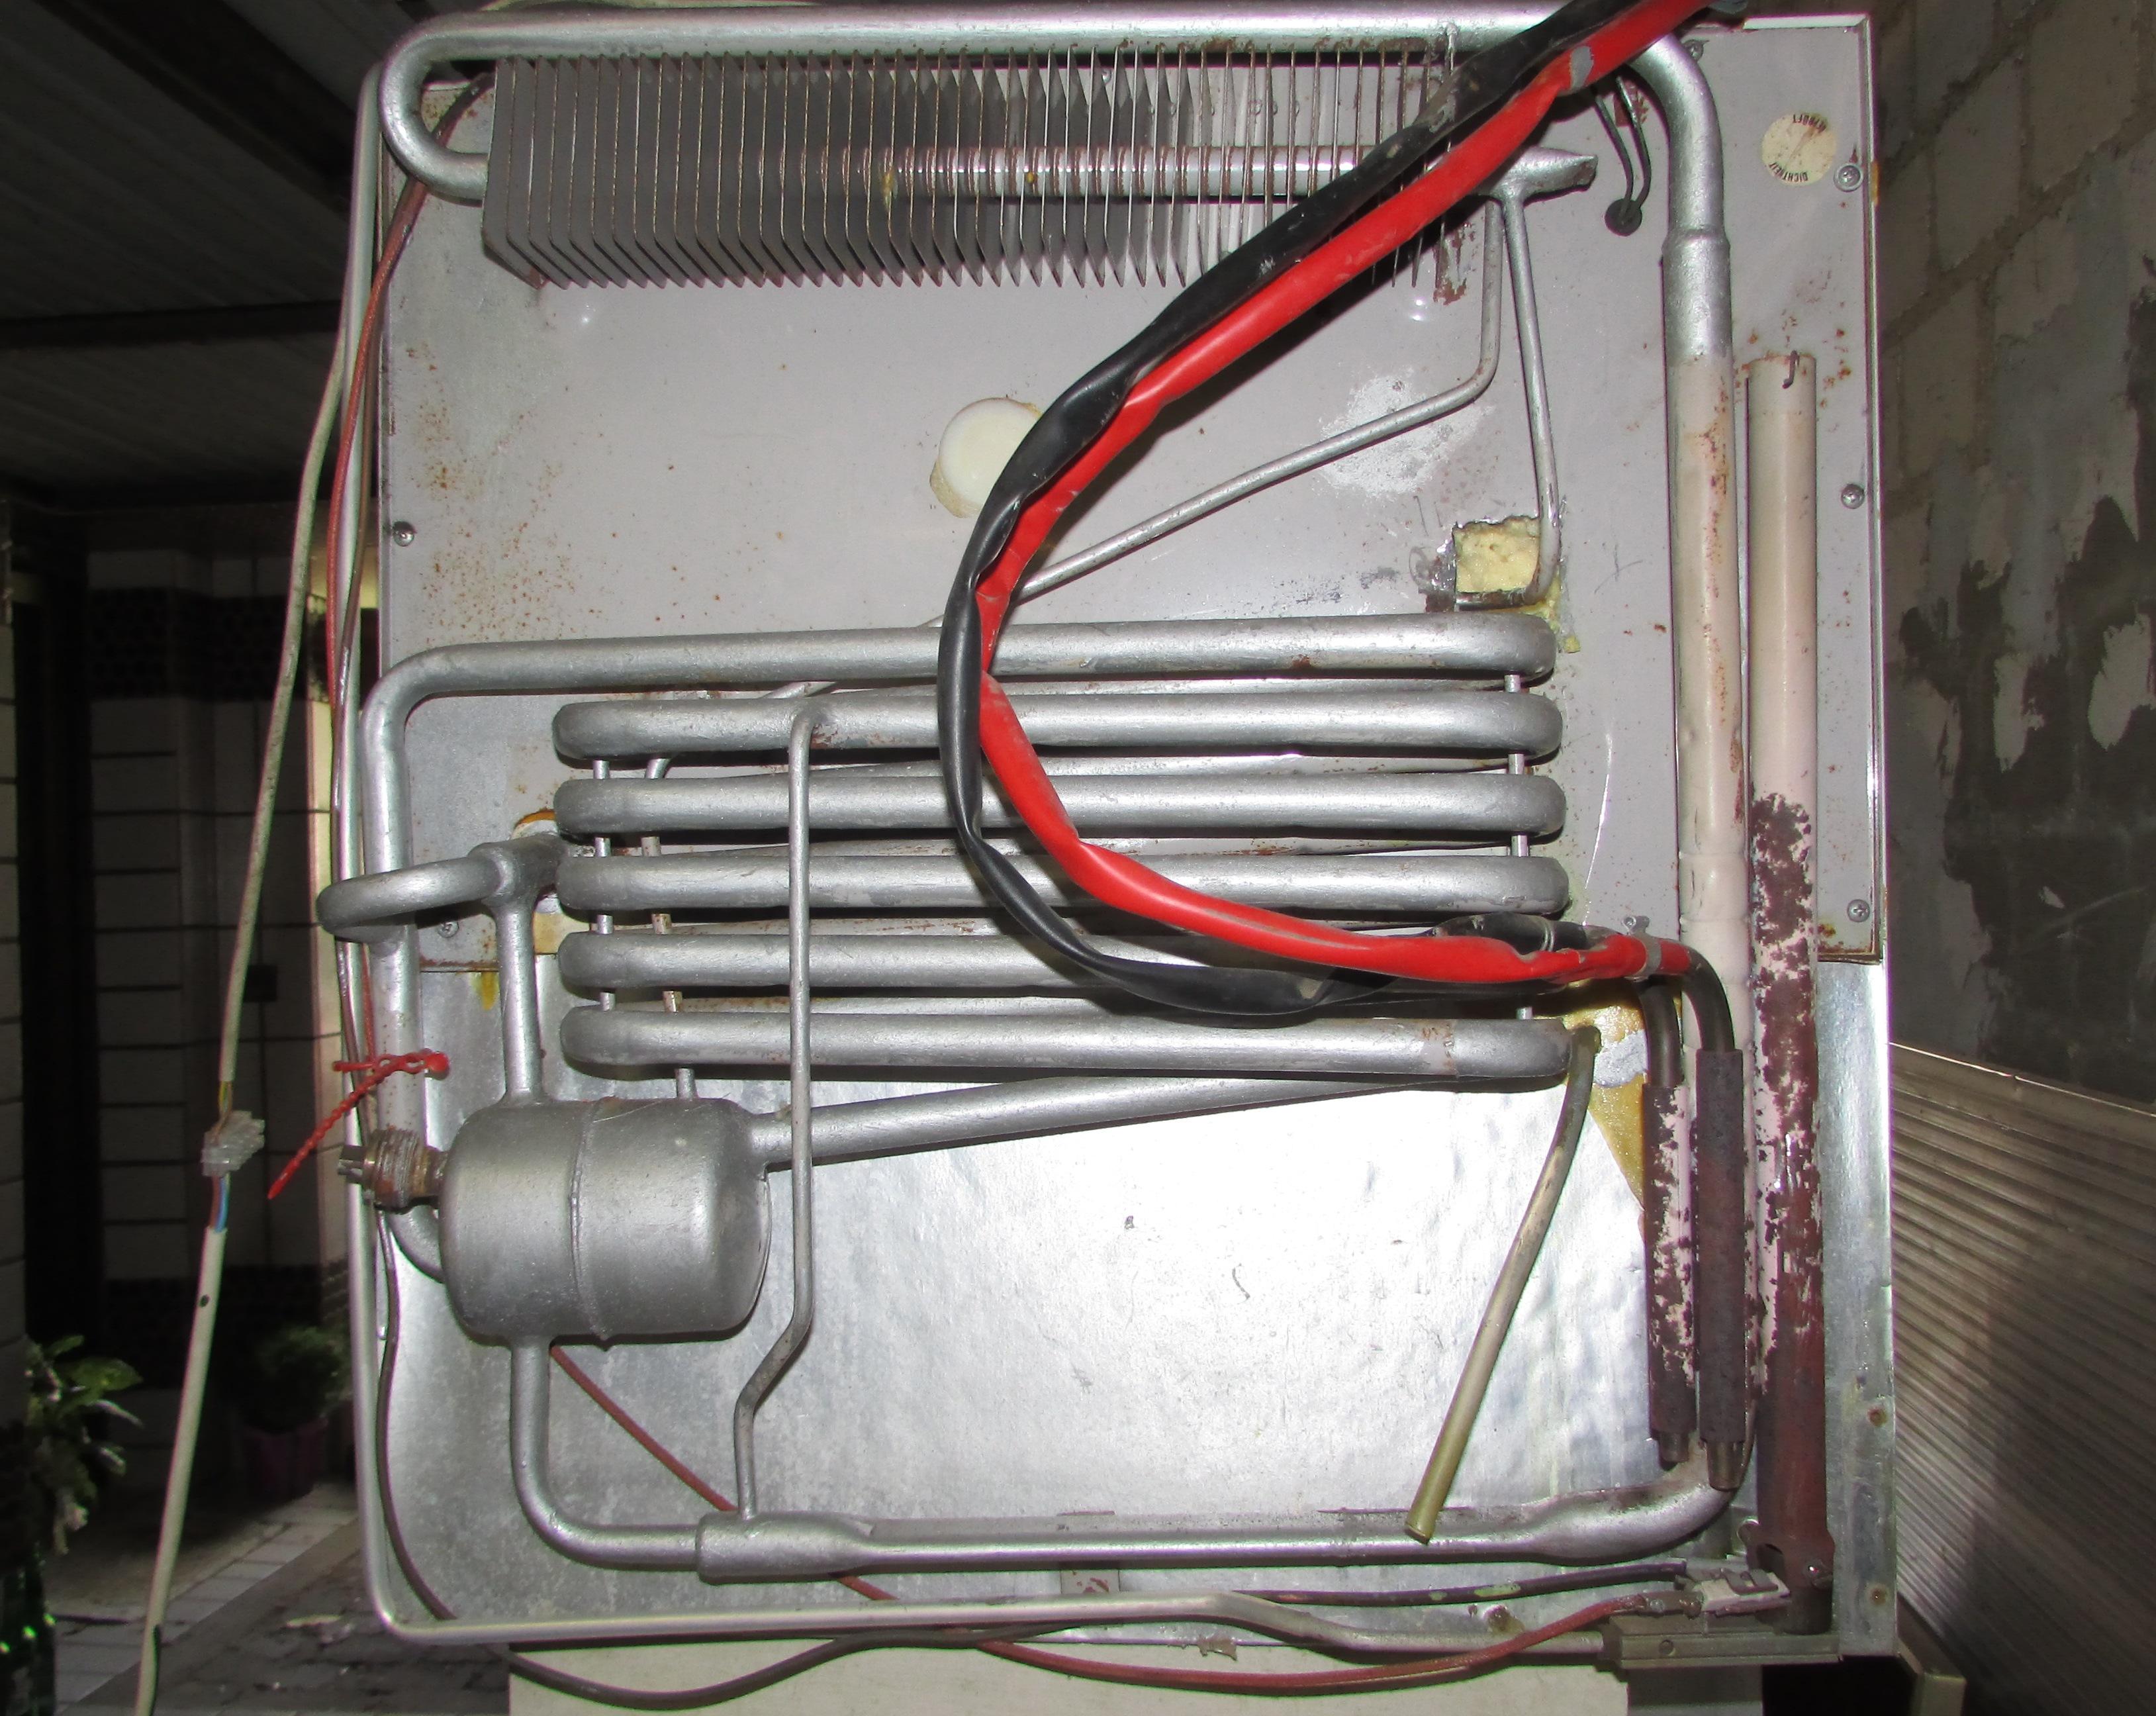 Kühlschrank Abfluss Reiniger : Kühlschrank abfluss reiniger lechner pflege reinigen rohr